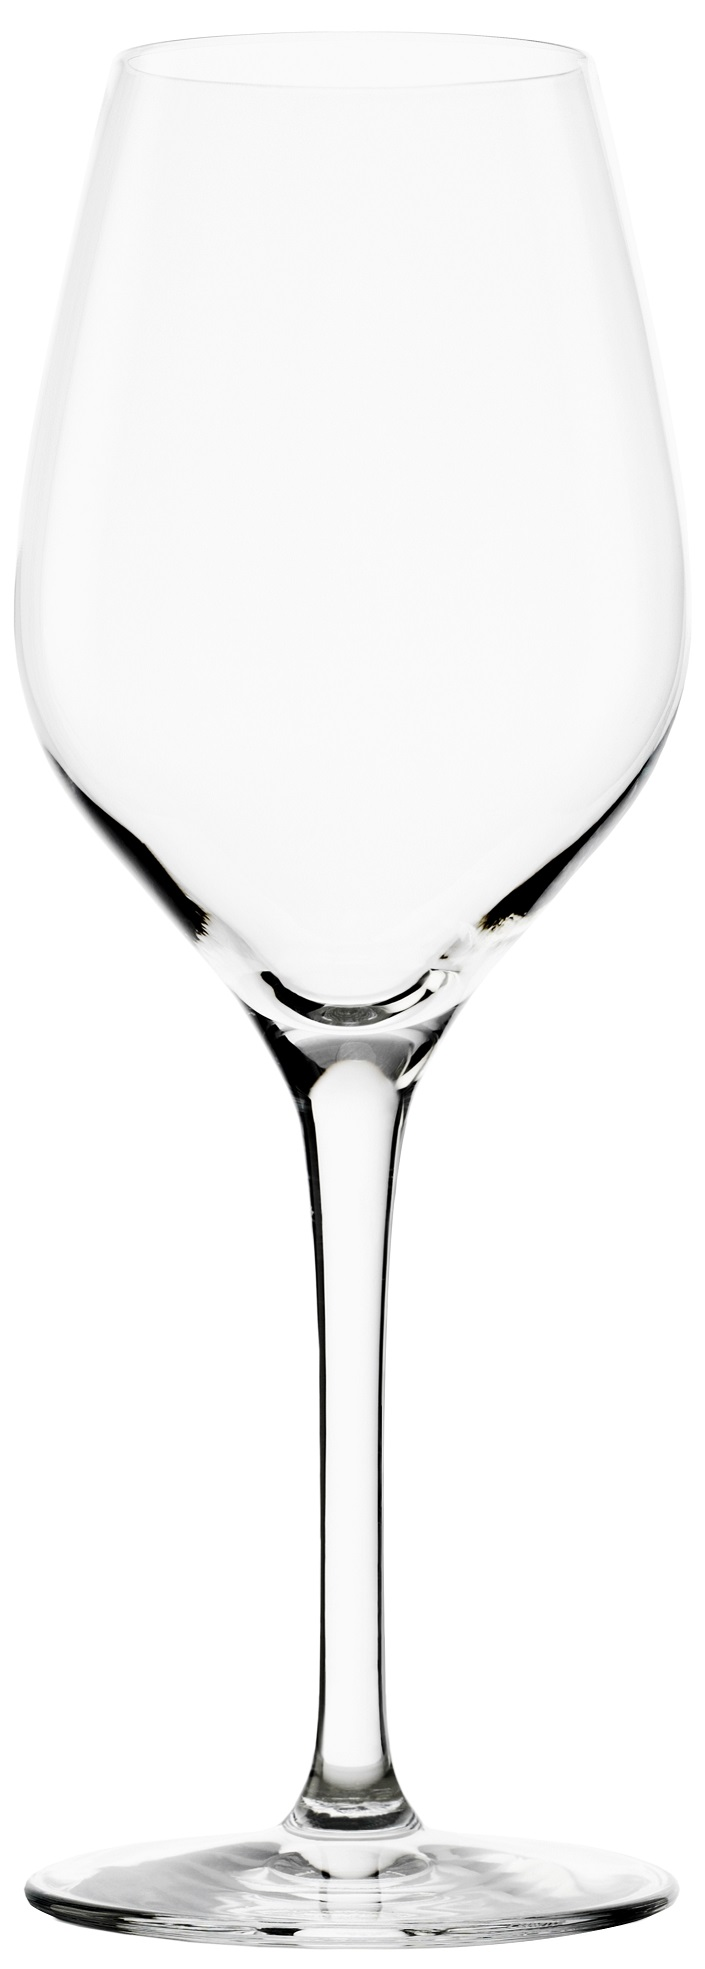 verre exquisit 27 cl